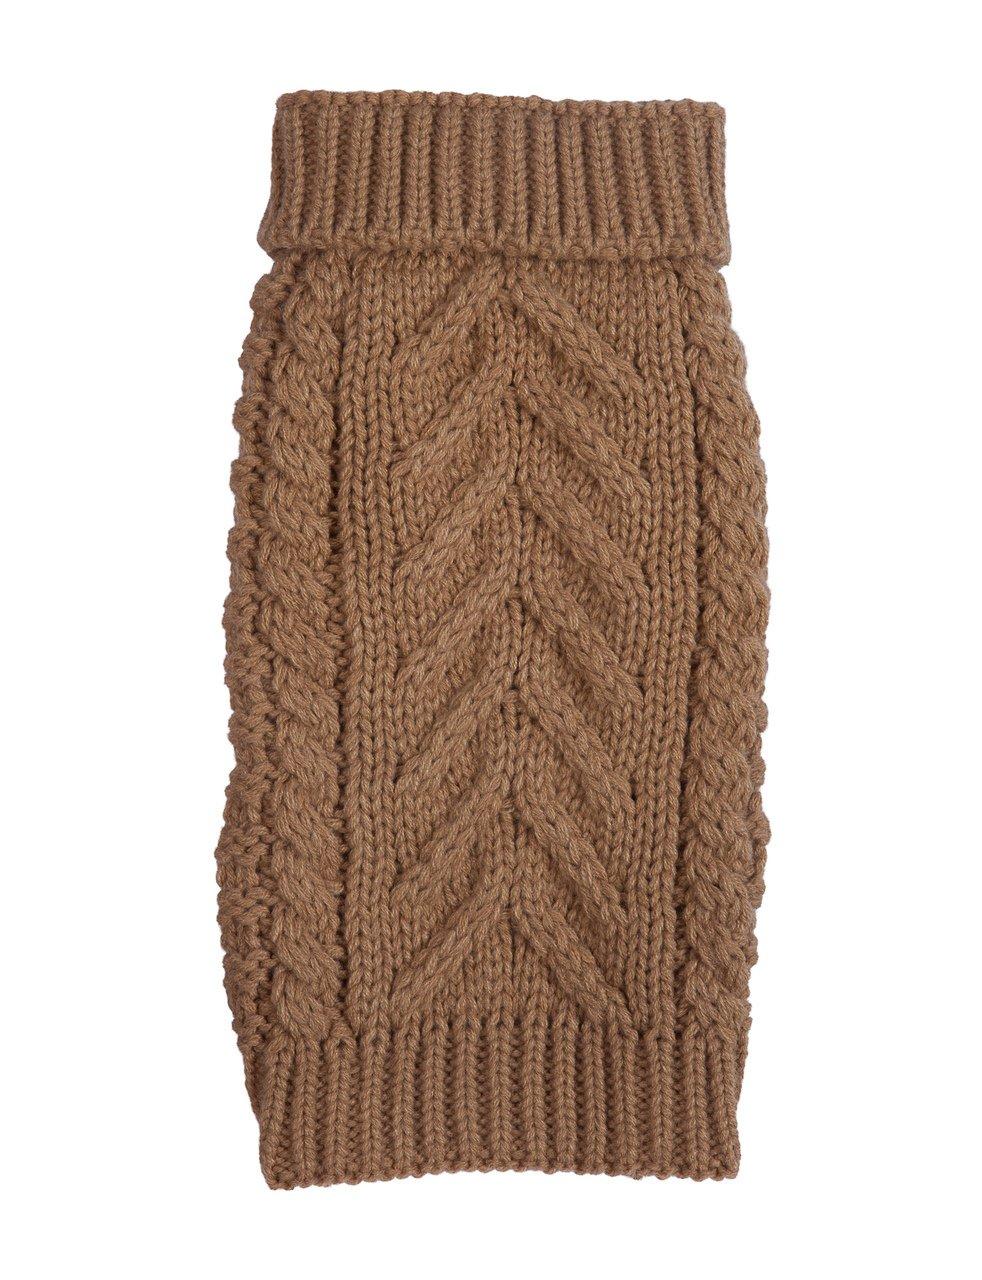 fabdog Super Chunky Knit Turtleneck Dog Sweater Camel (14'')